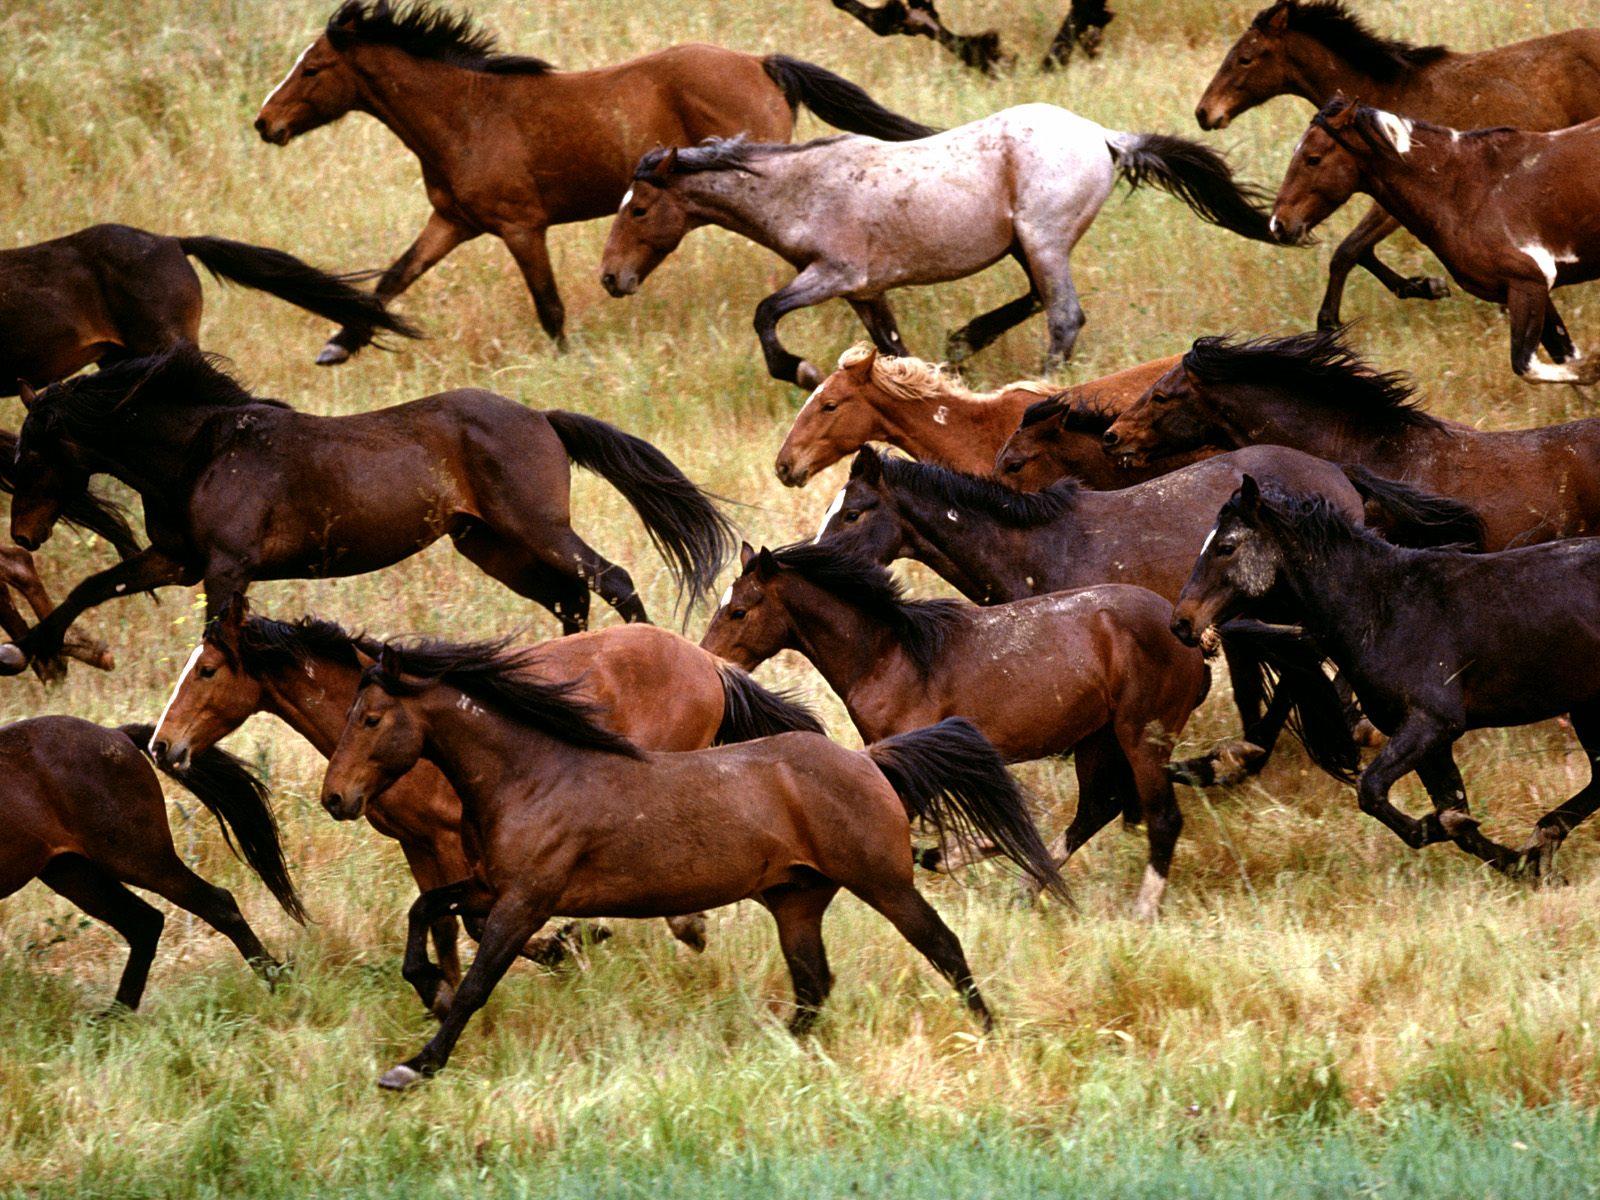 wild horses running wallpapers - photo #21